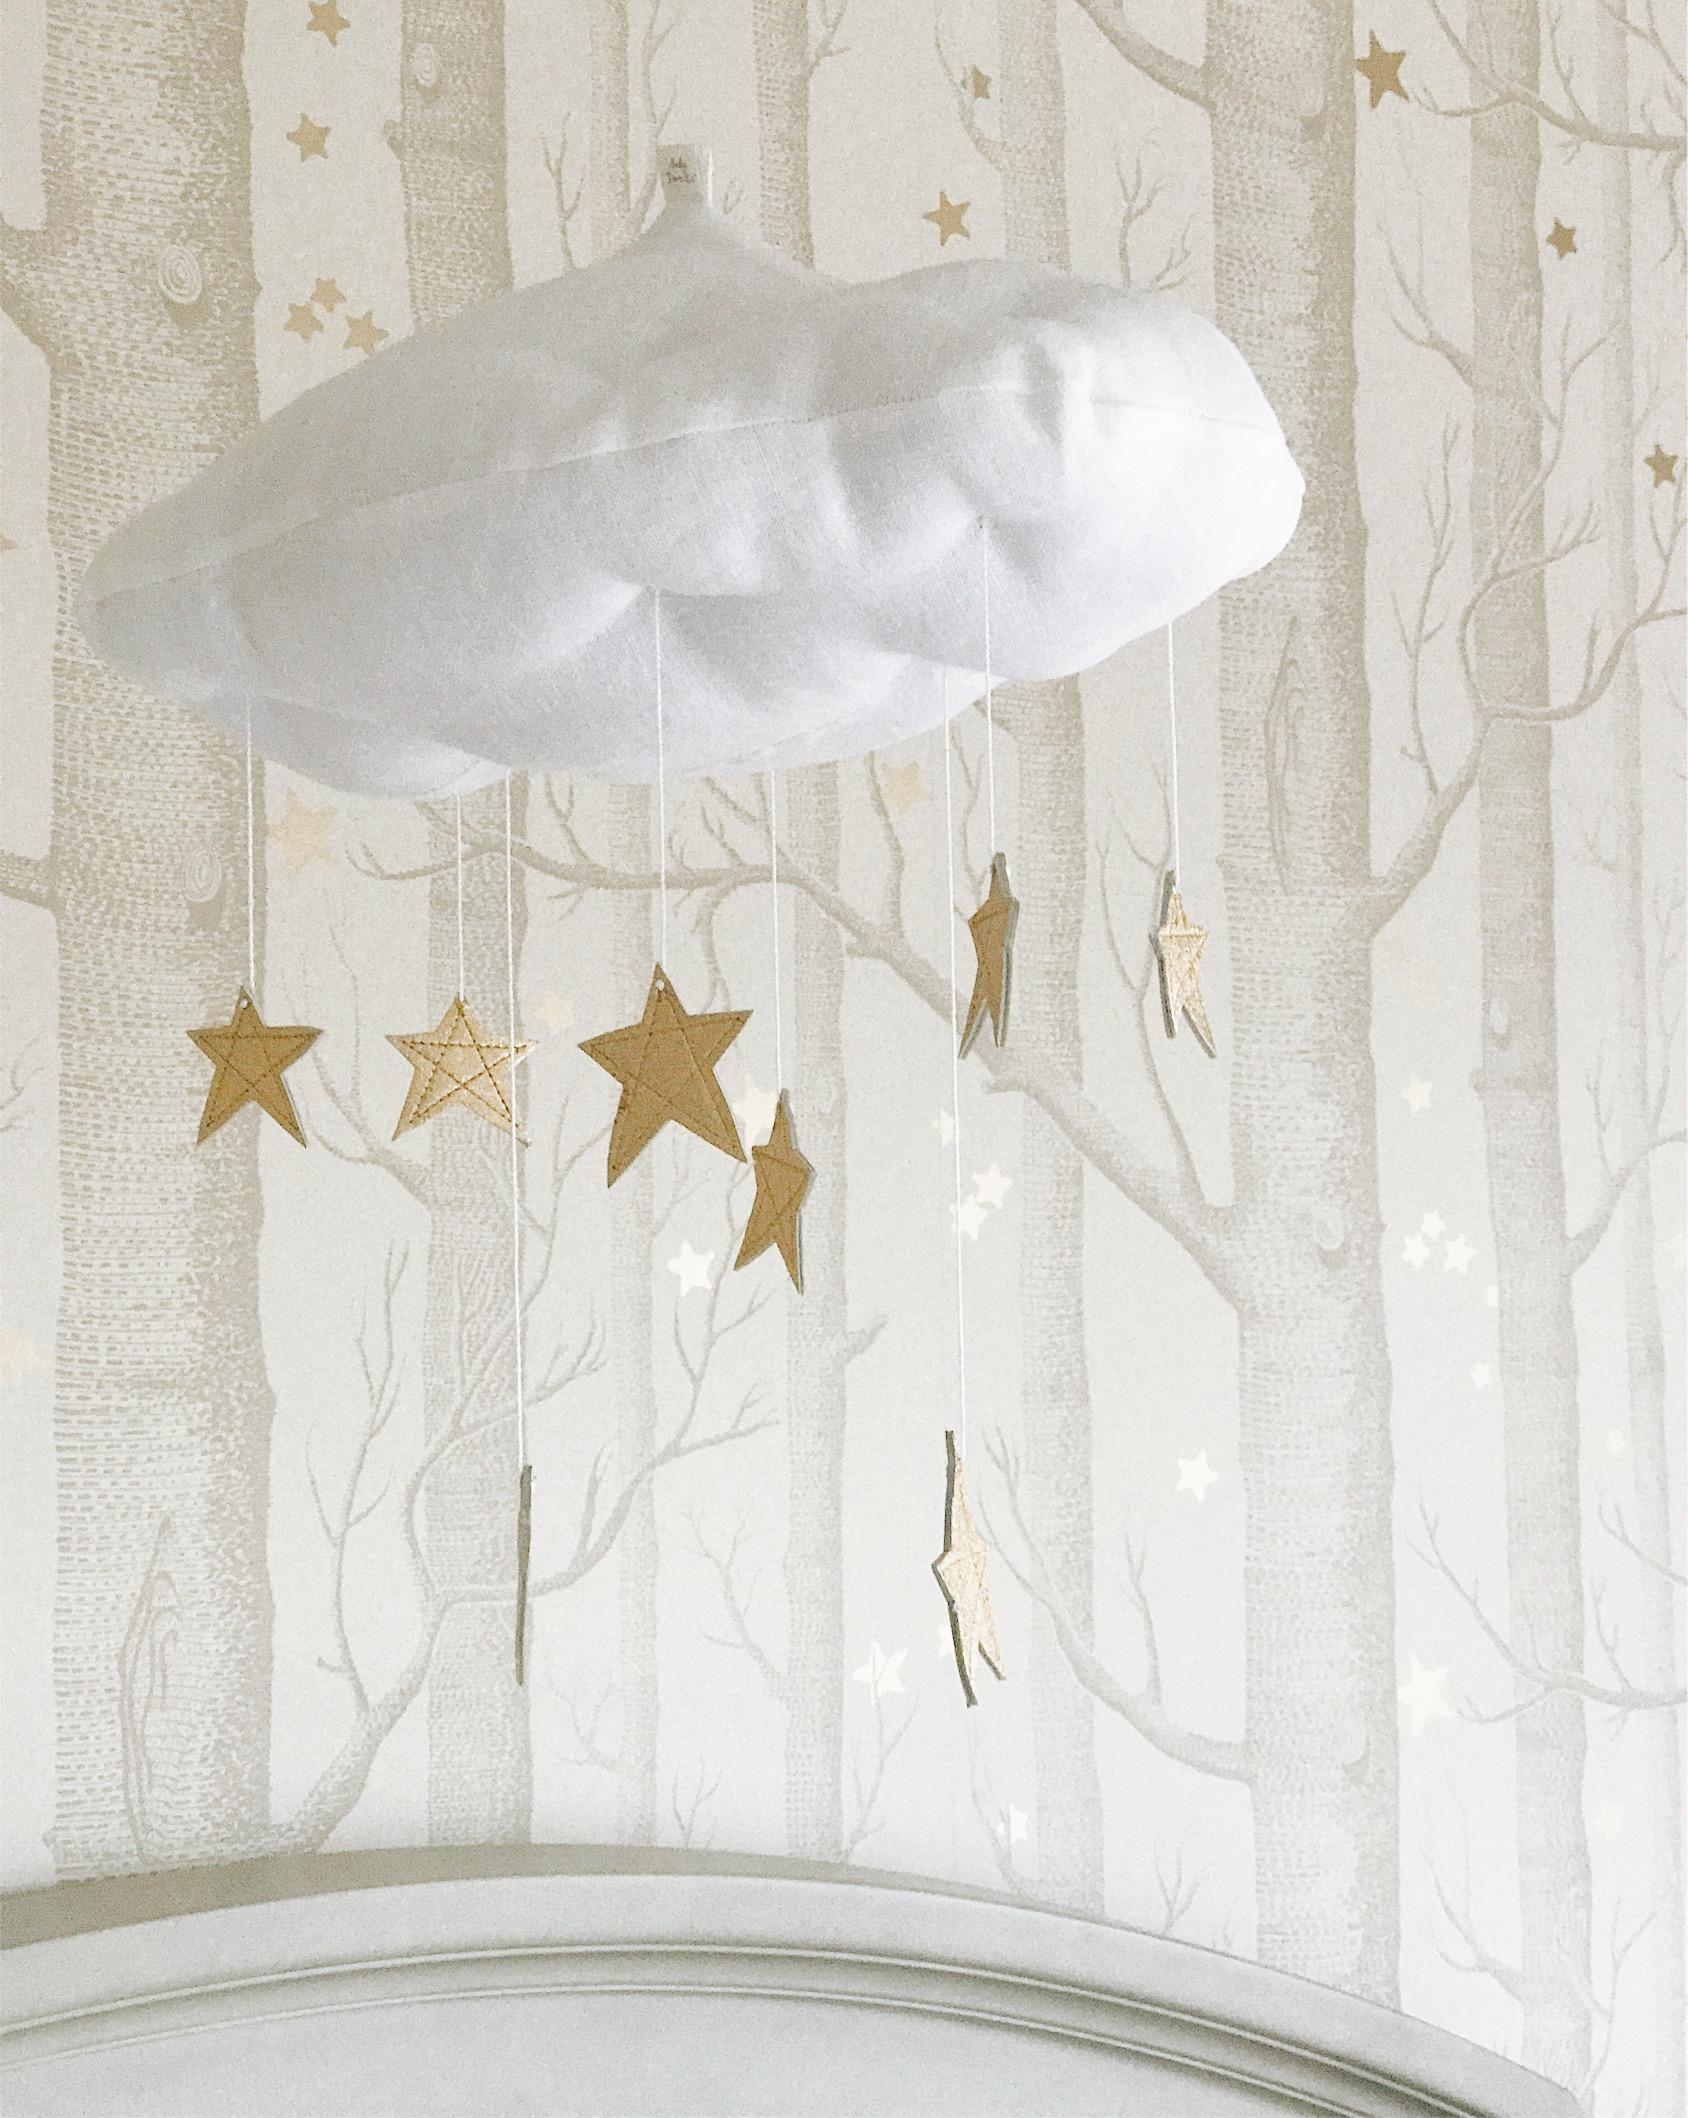 Gender Neutral Nursery, Nyla Free Designs Inc., Calgary Interior Designer